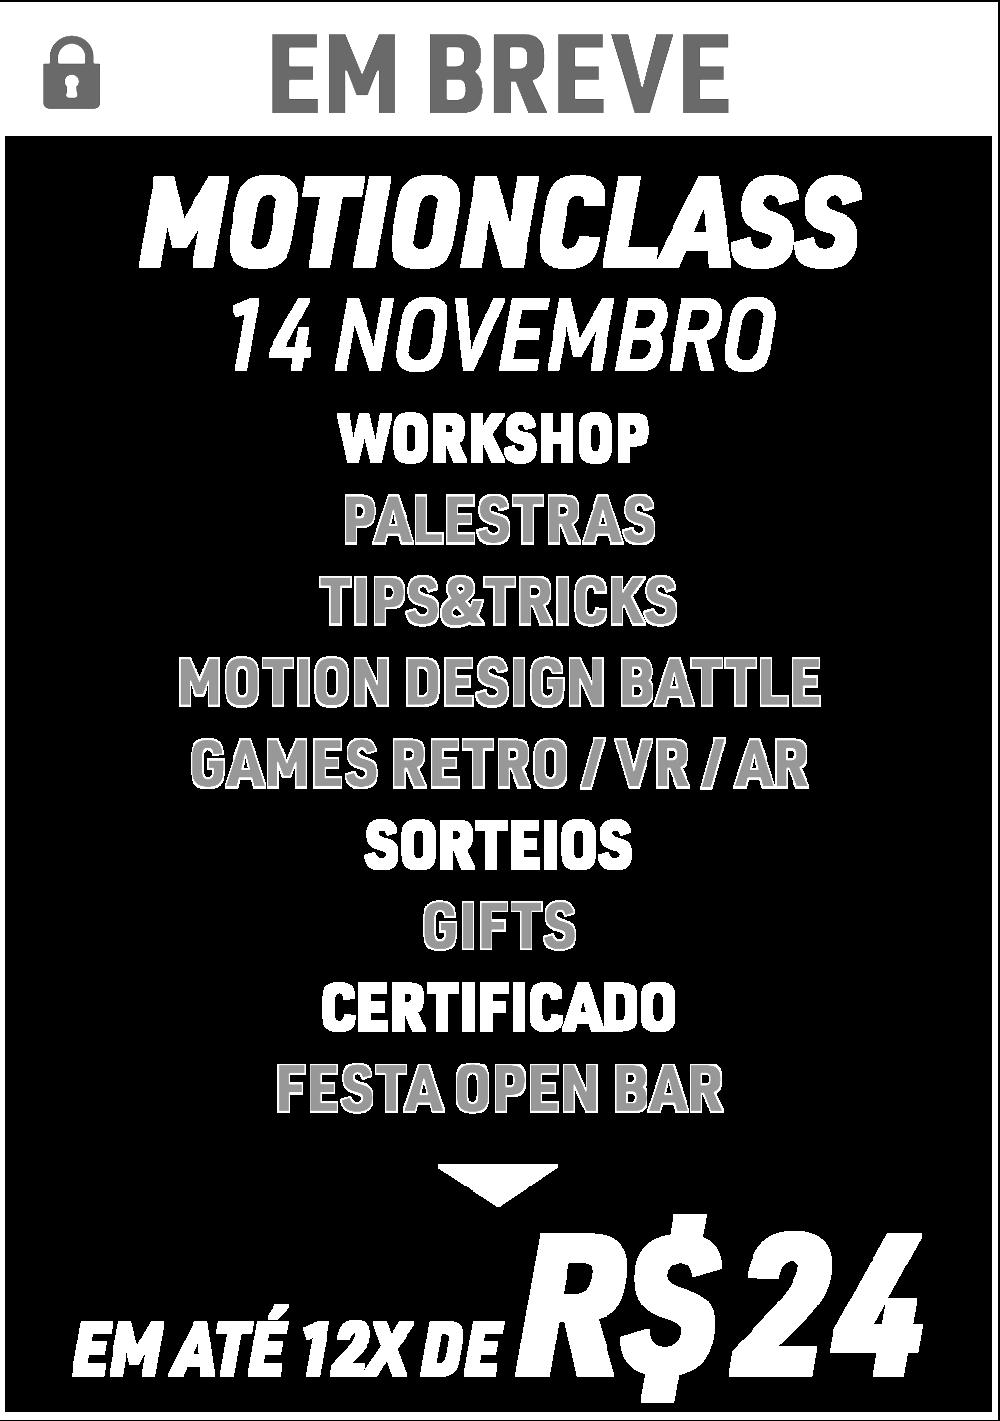 motionclass b 1 lote fechado.png